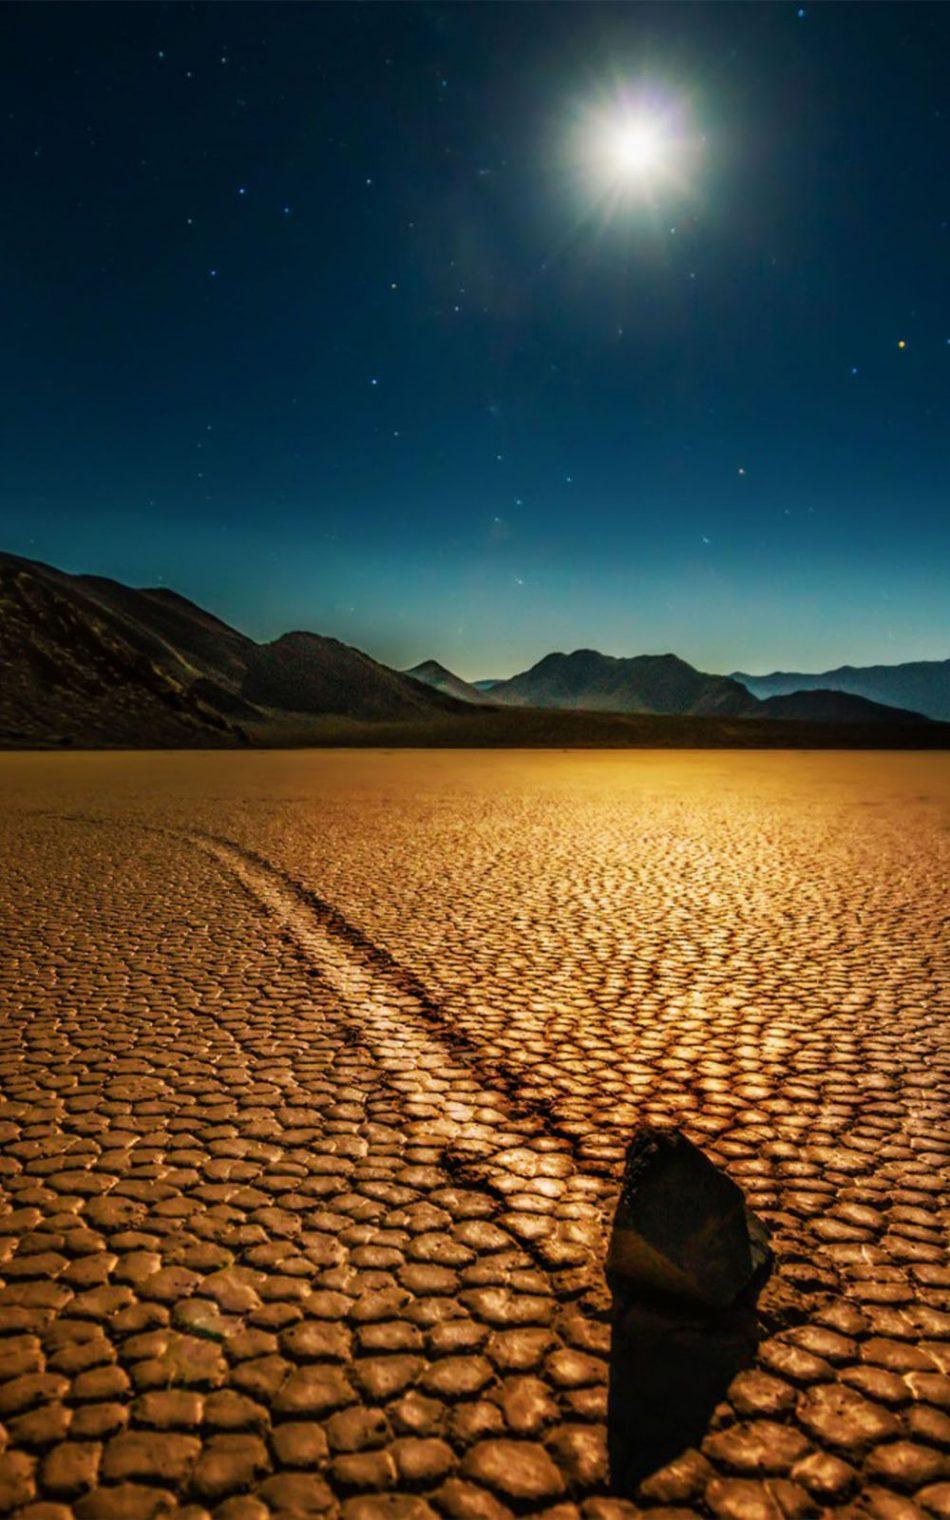 Download Sunny Desert Stone Free Pure 4k Ultra Hd Mobile Wallpaper